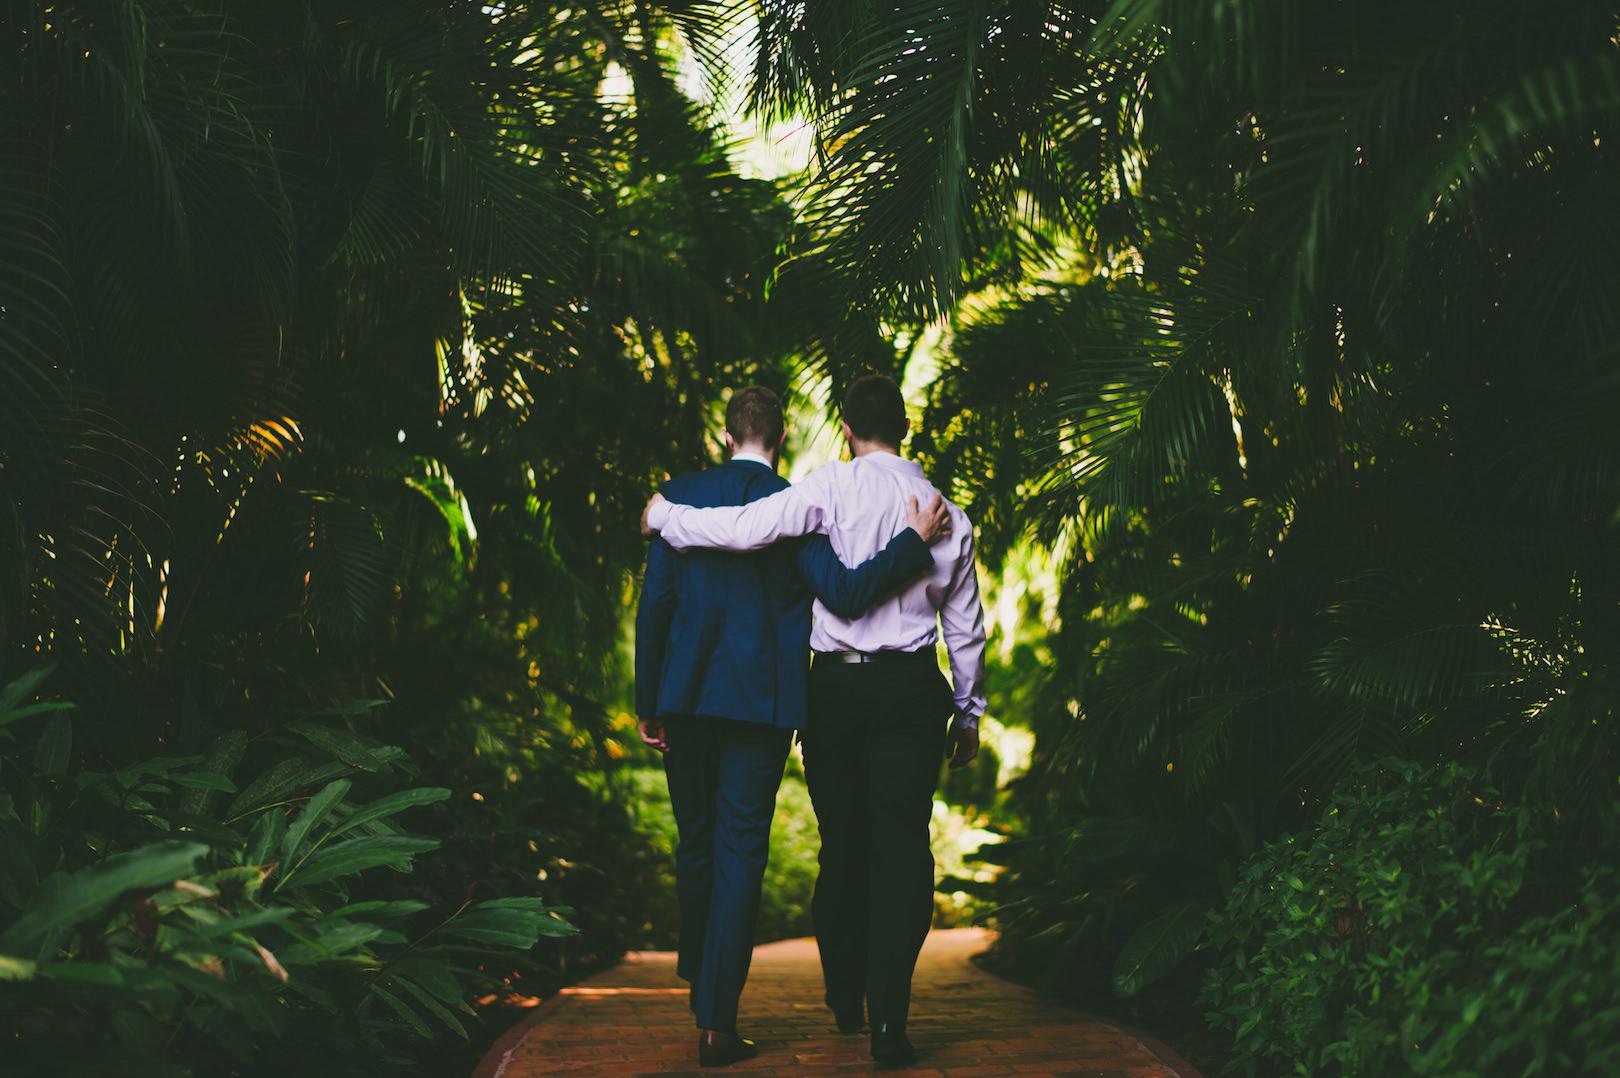 Nathan & Felicia - Wedding Day - © Dallas Kolotylo Photography - 246